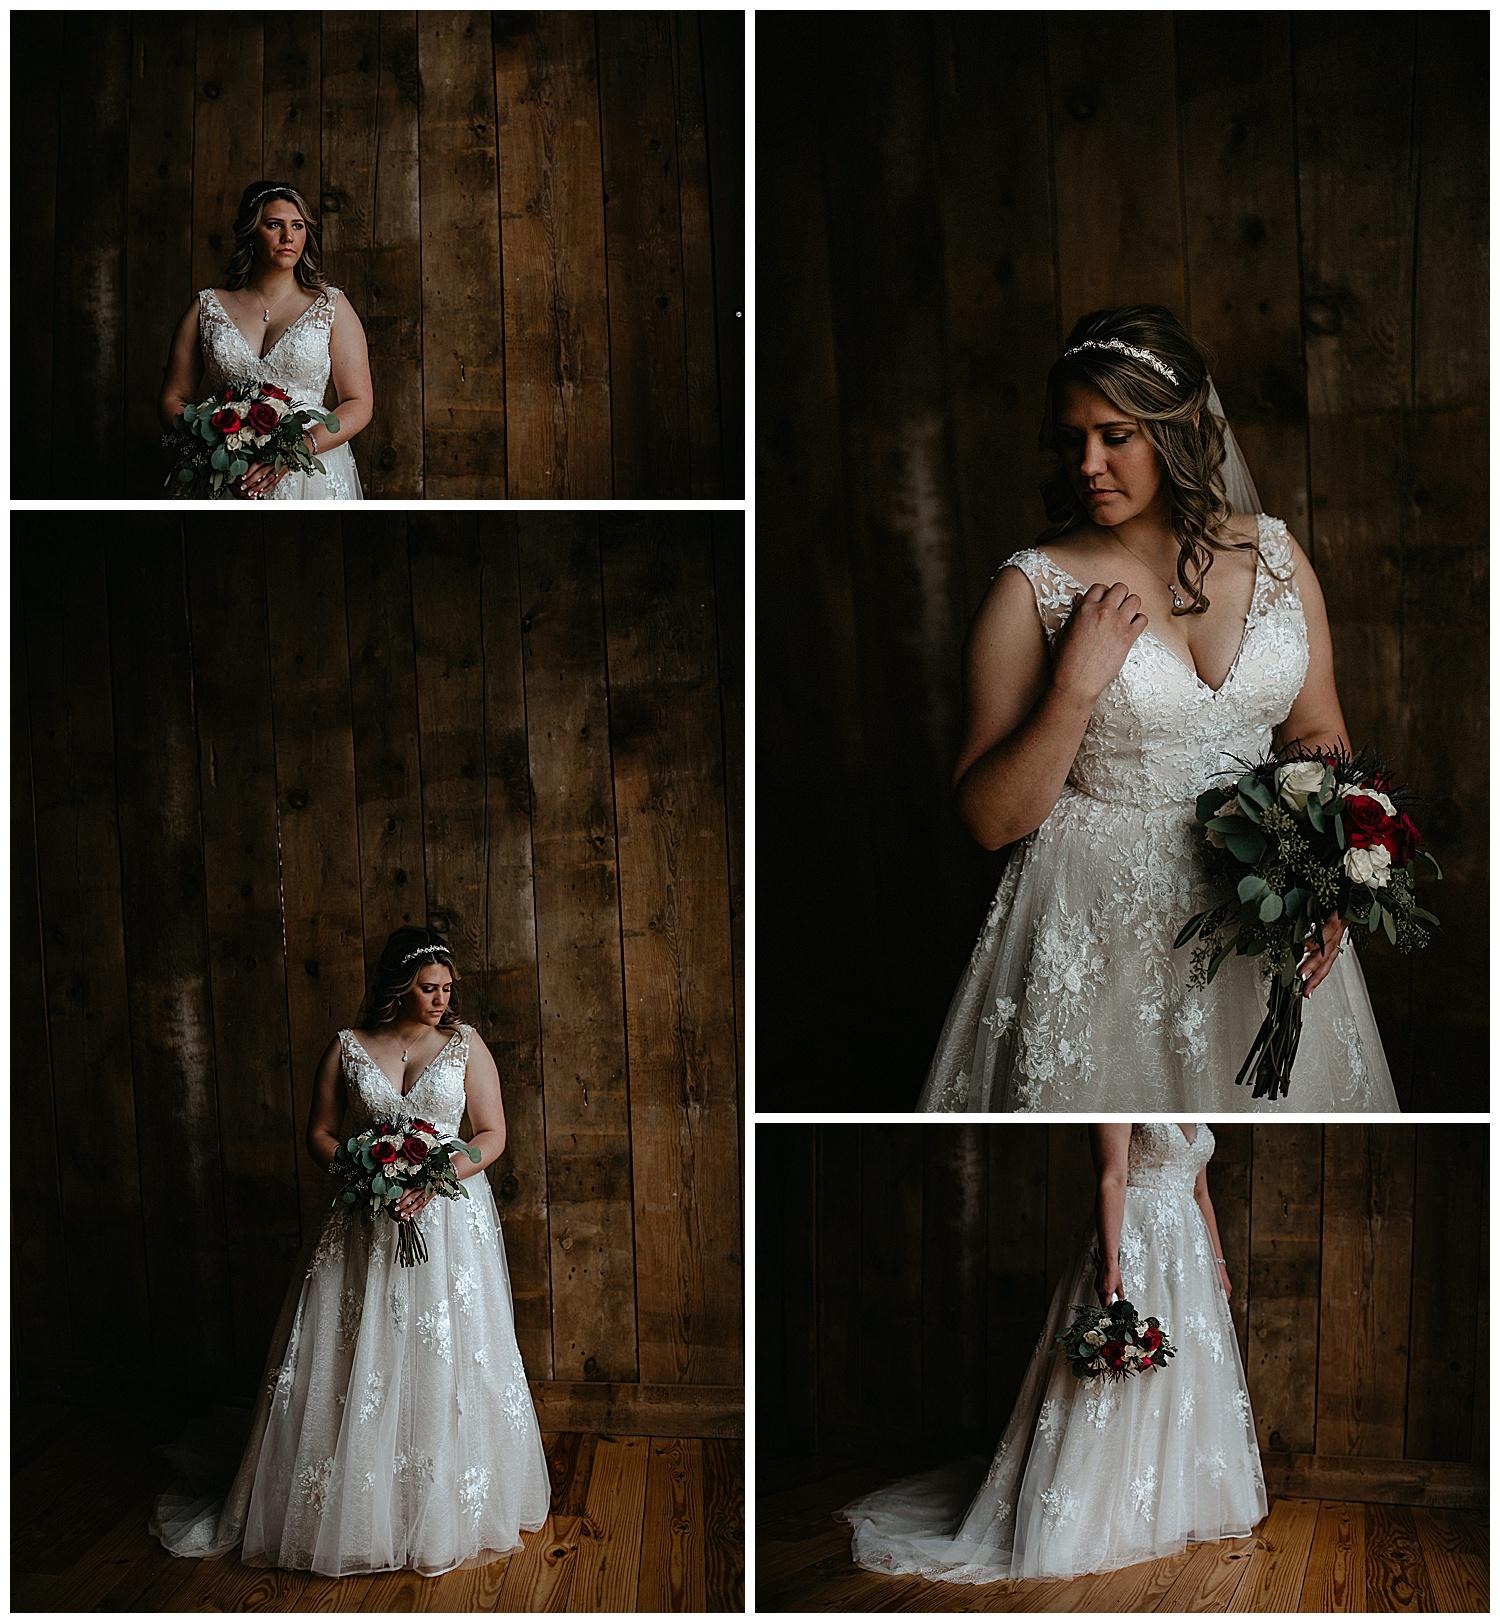 NEPA-Bloomgsburg-Wedding-Photographer-at-The-Barn-at-Greystone-Farms-Watsontown-PA_0021.jpg